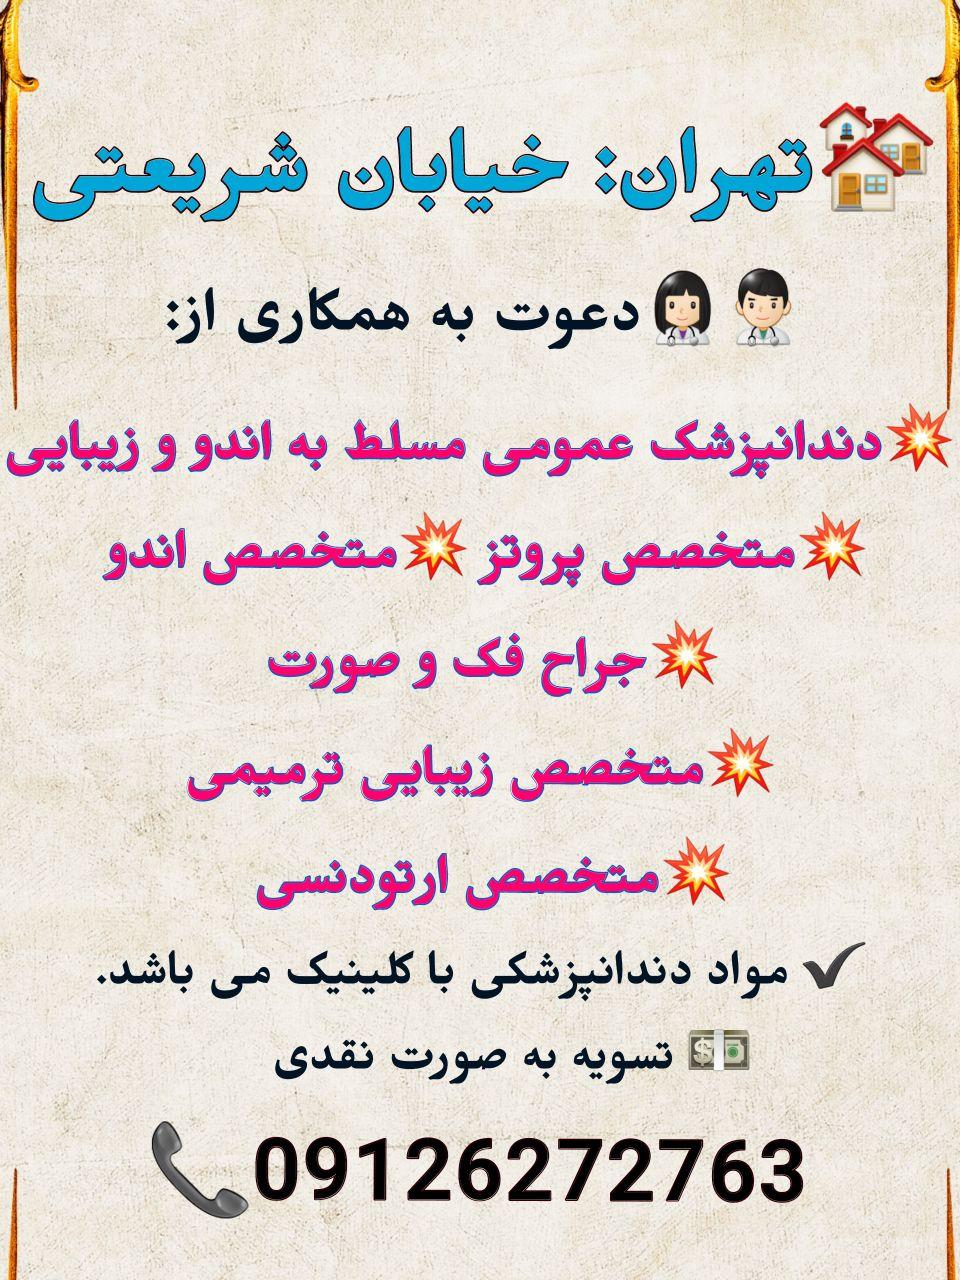 تهران: خیابان شریعتی